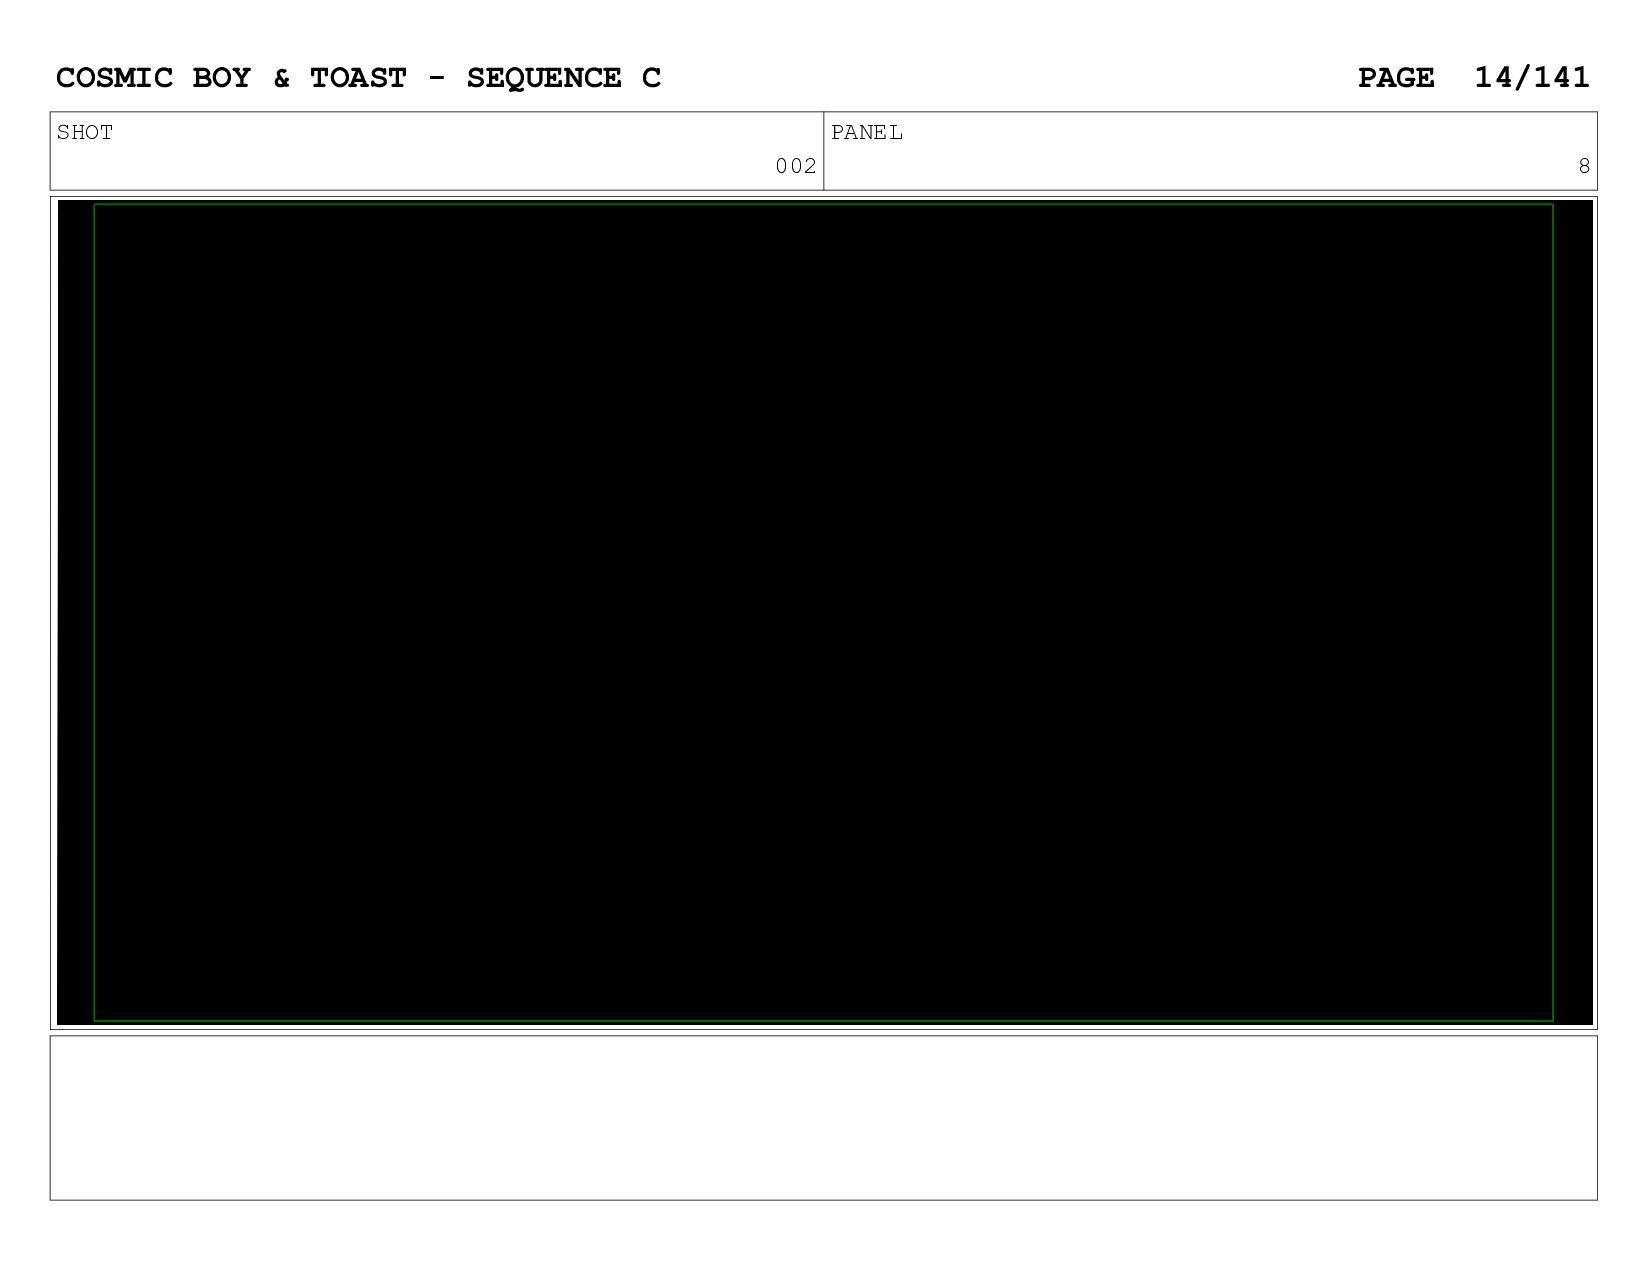 SCENE 002 PANEL H COSMIC BOY & TOAST - SEQUENCE...